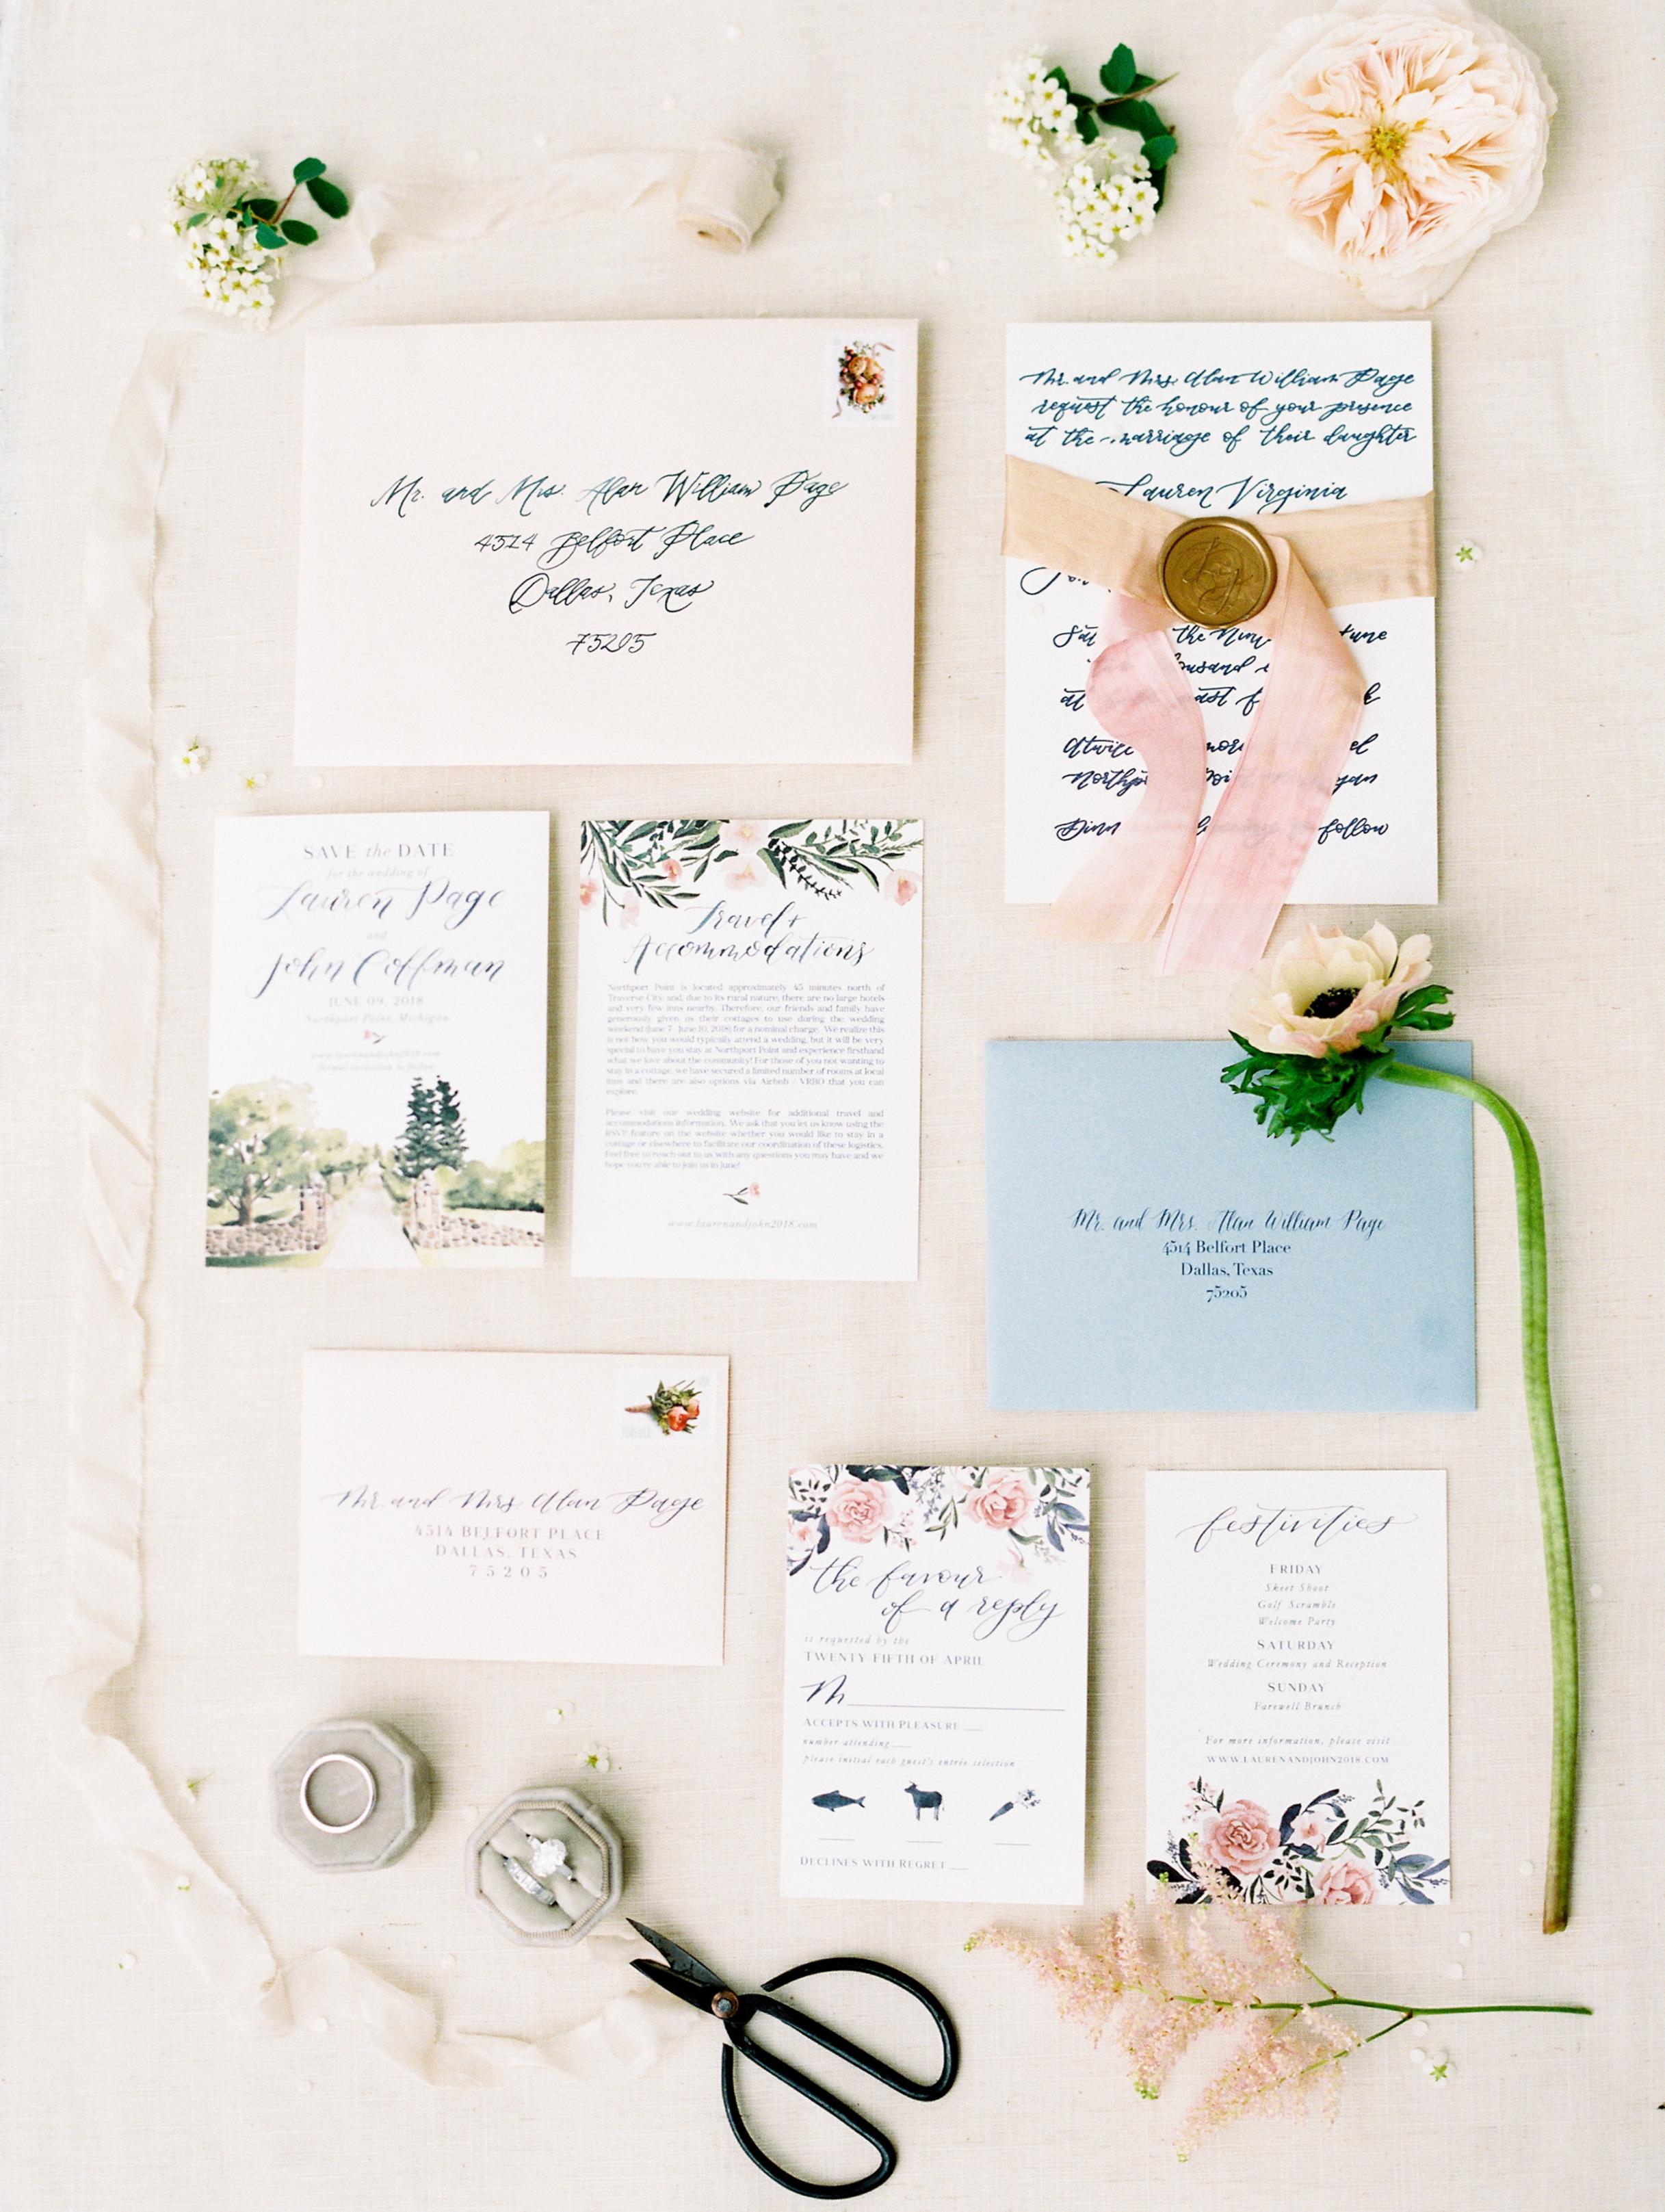 Coffman+Wedding+Details-41.jpg